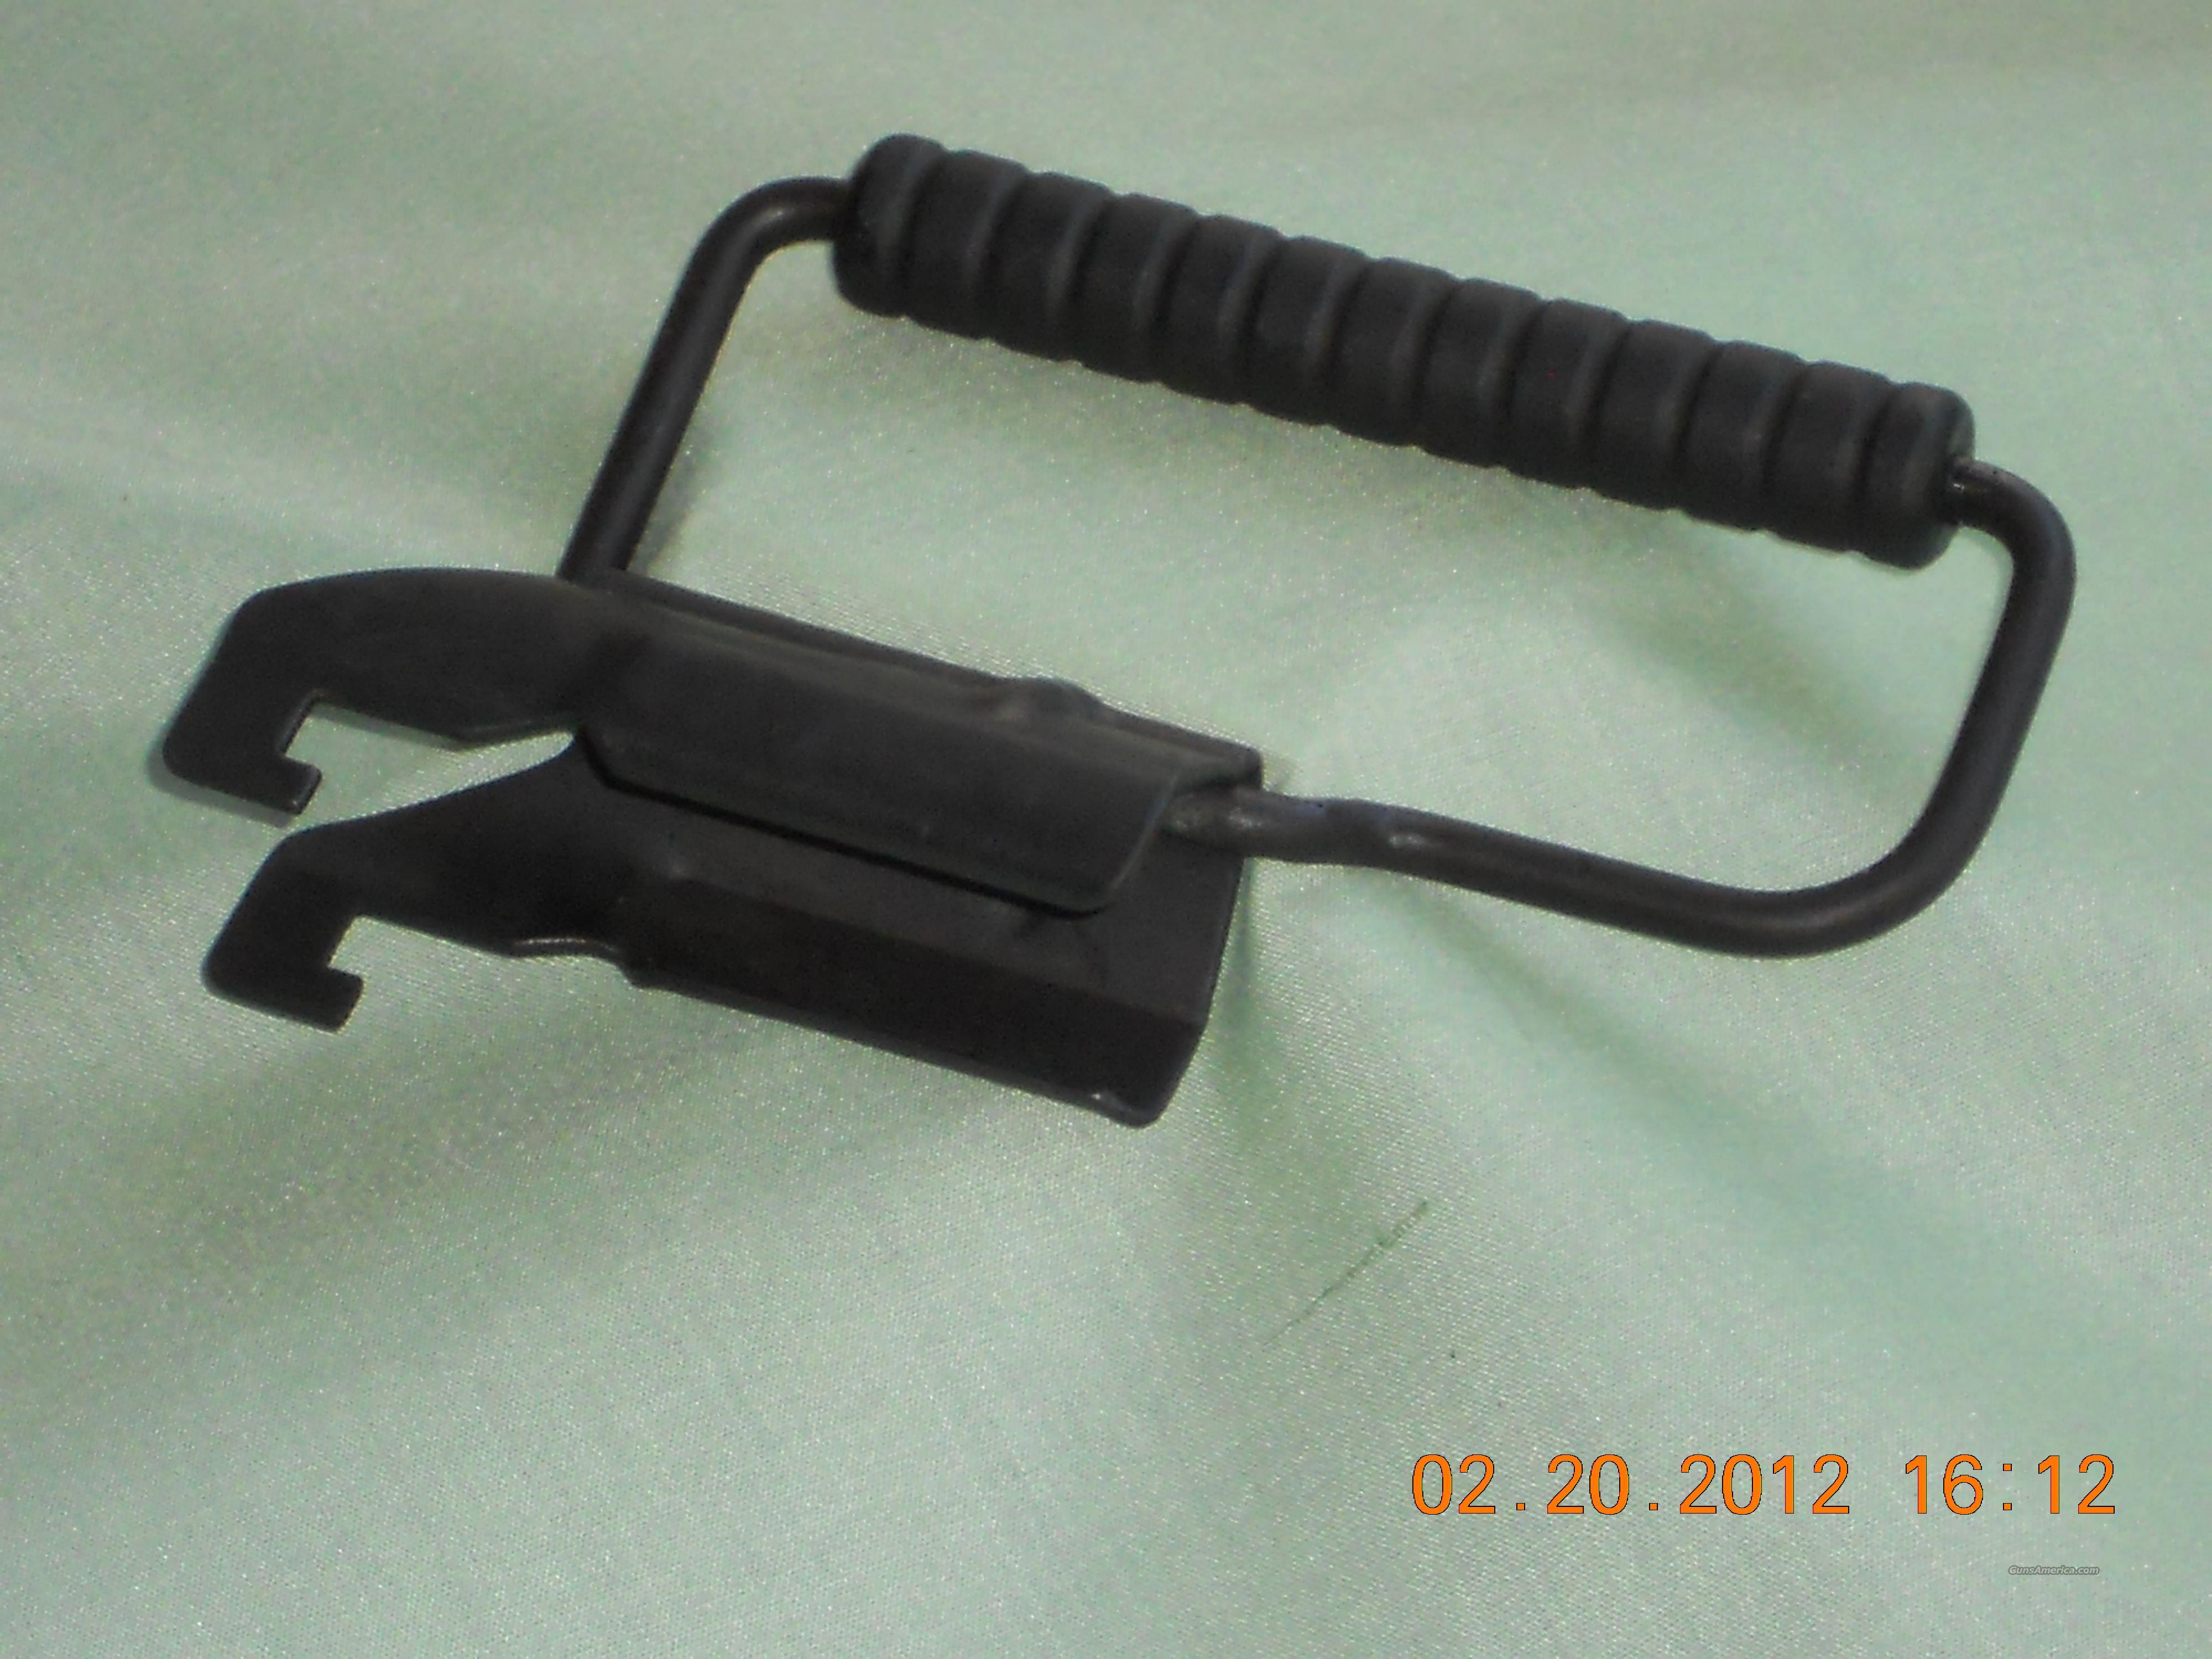 HK 33 / HK93  CARRY HANDLE  Non-Guns > Gun Parts > Military - Foreign